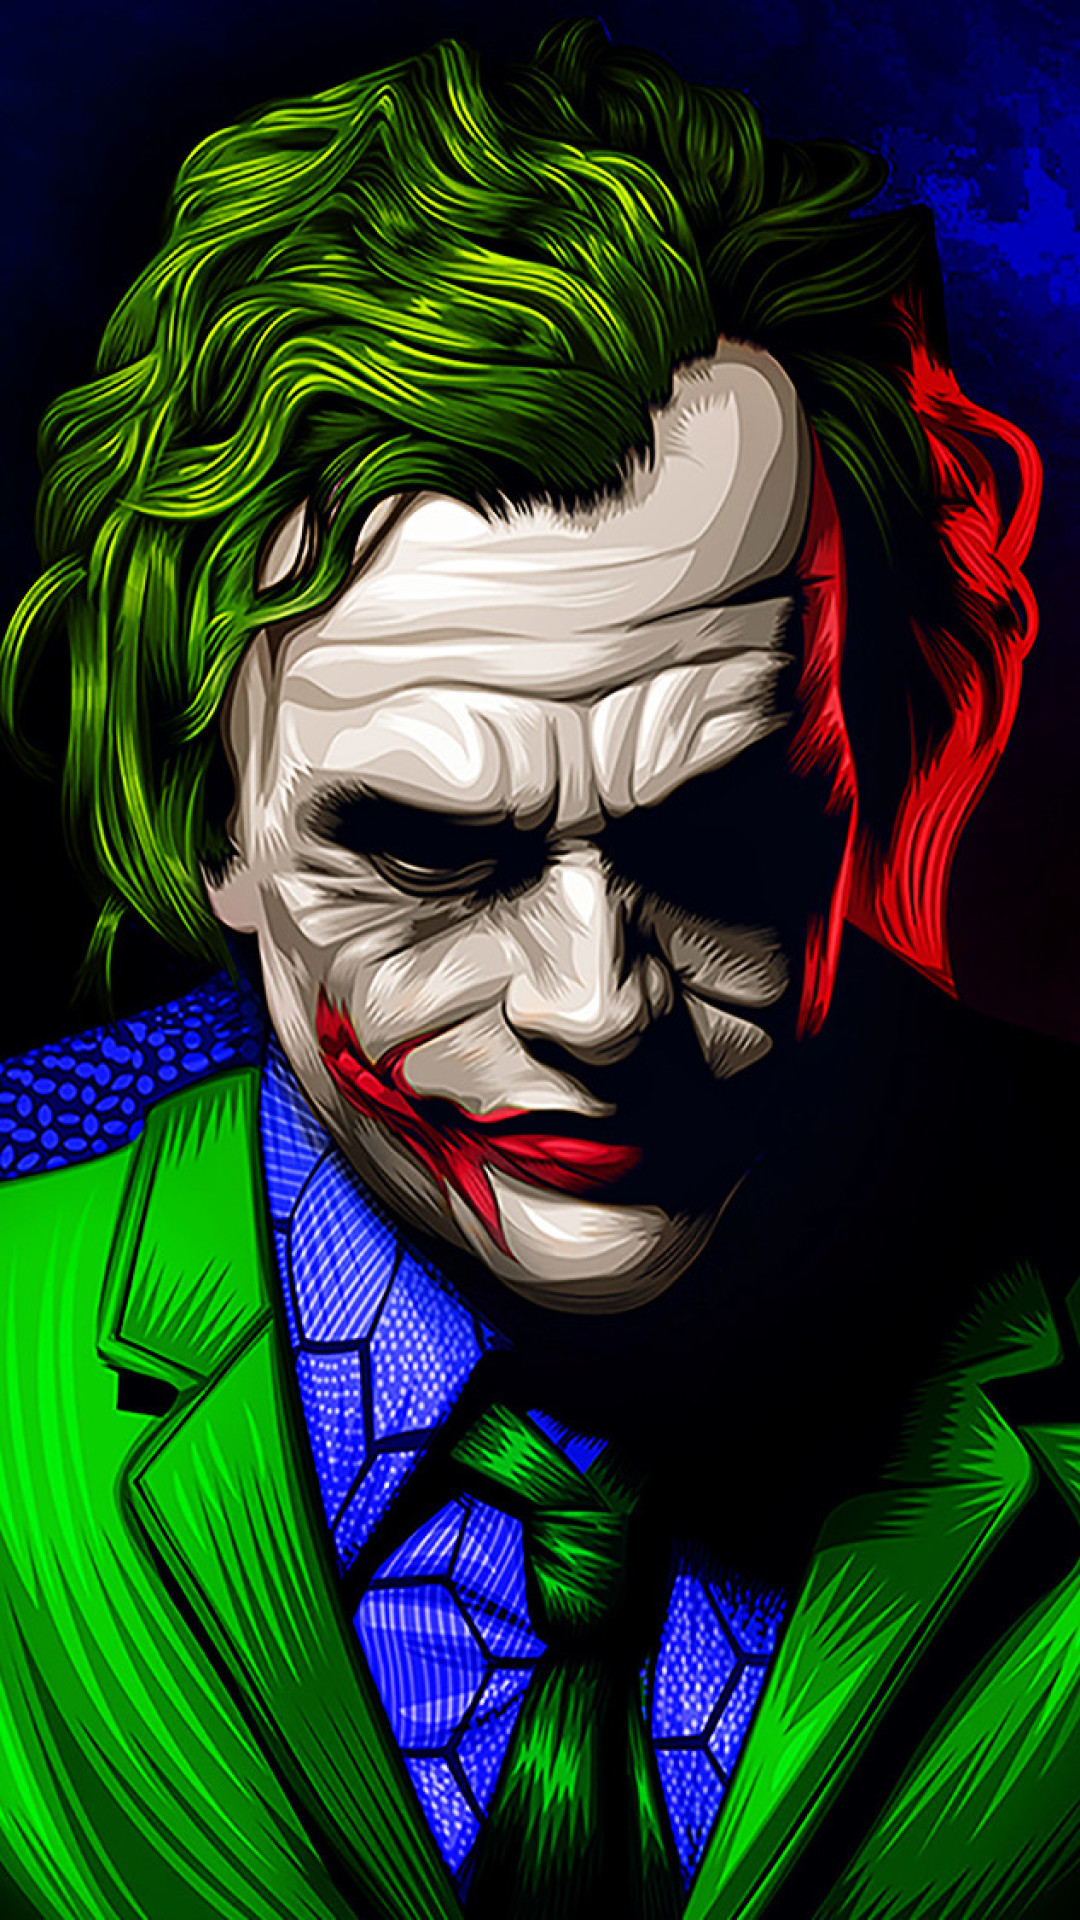 New Joker Wallpaper 4k Ultra Hd Joker 2834865 Hd Wallpaper Backgrounds Download